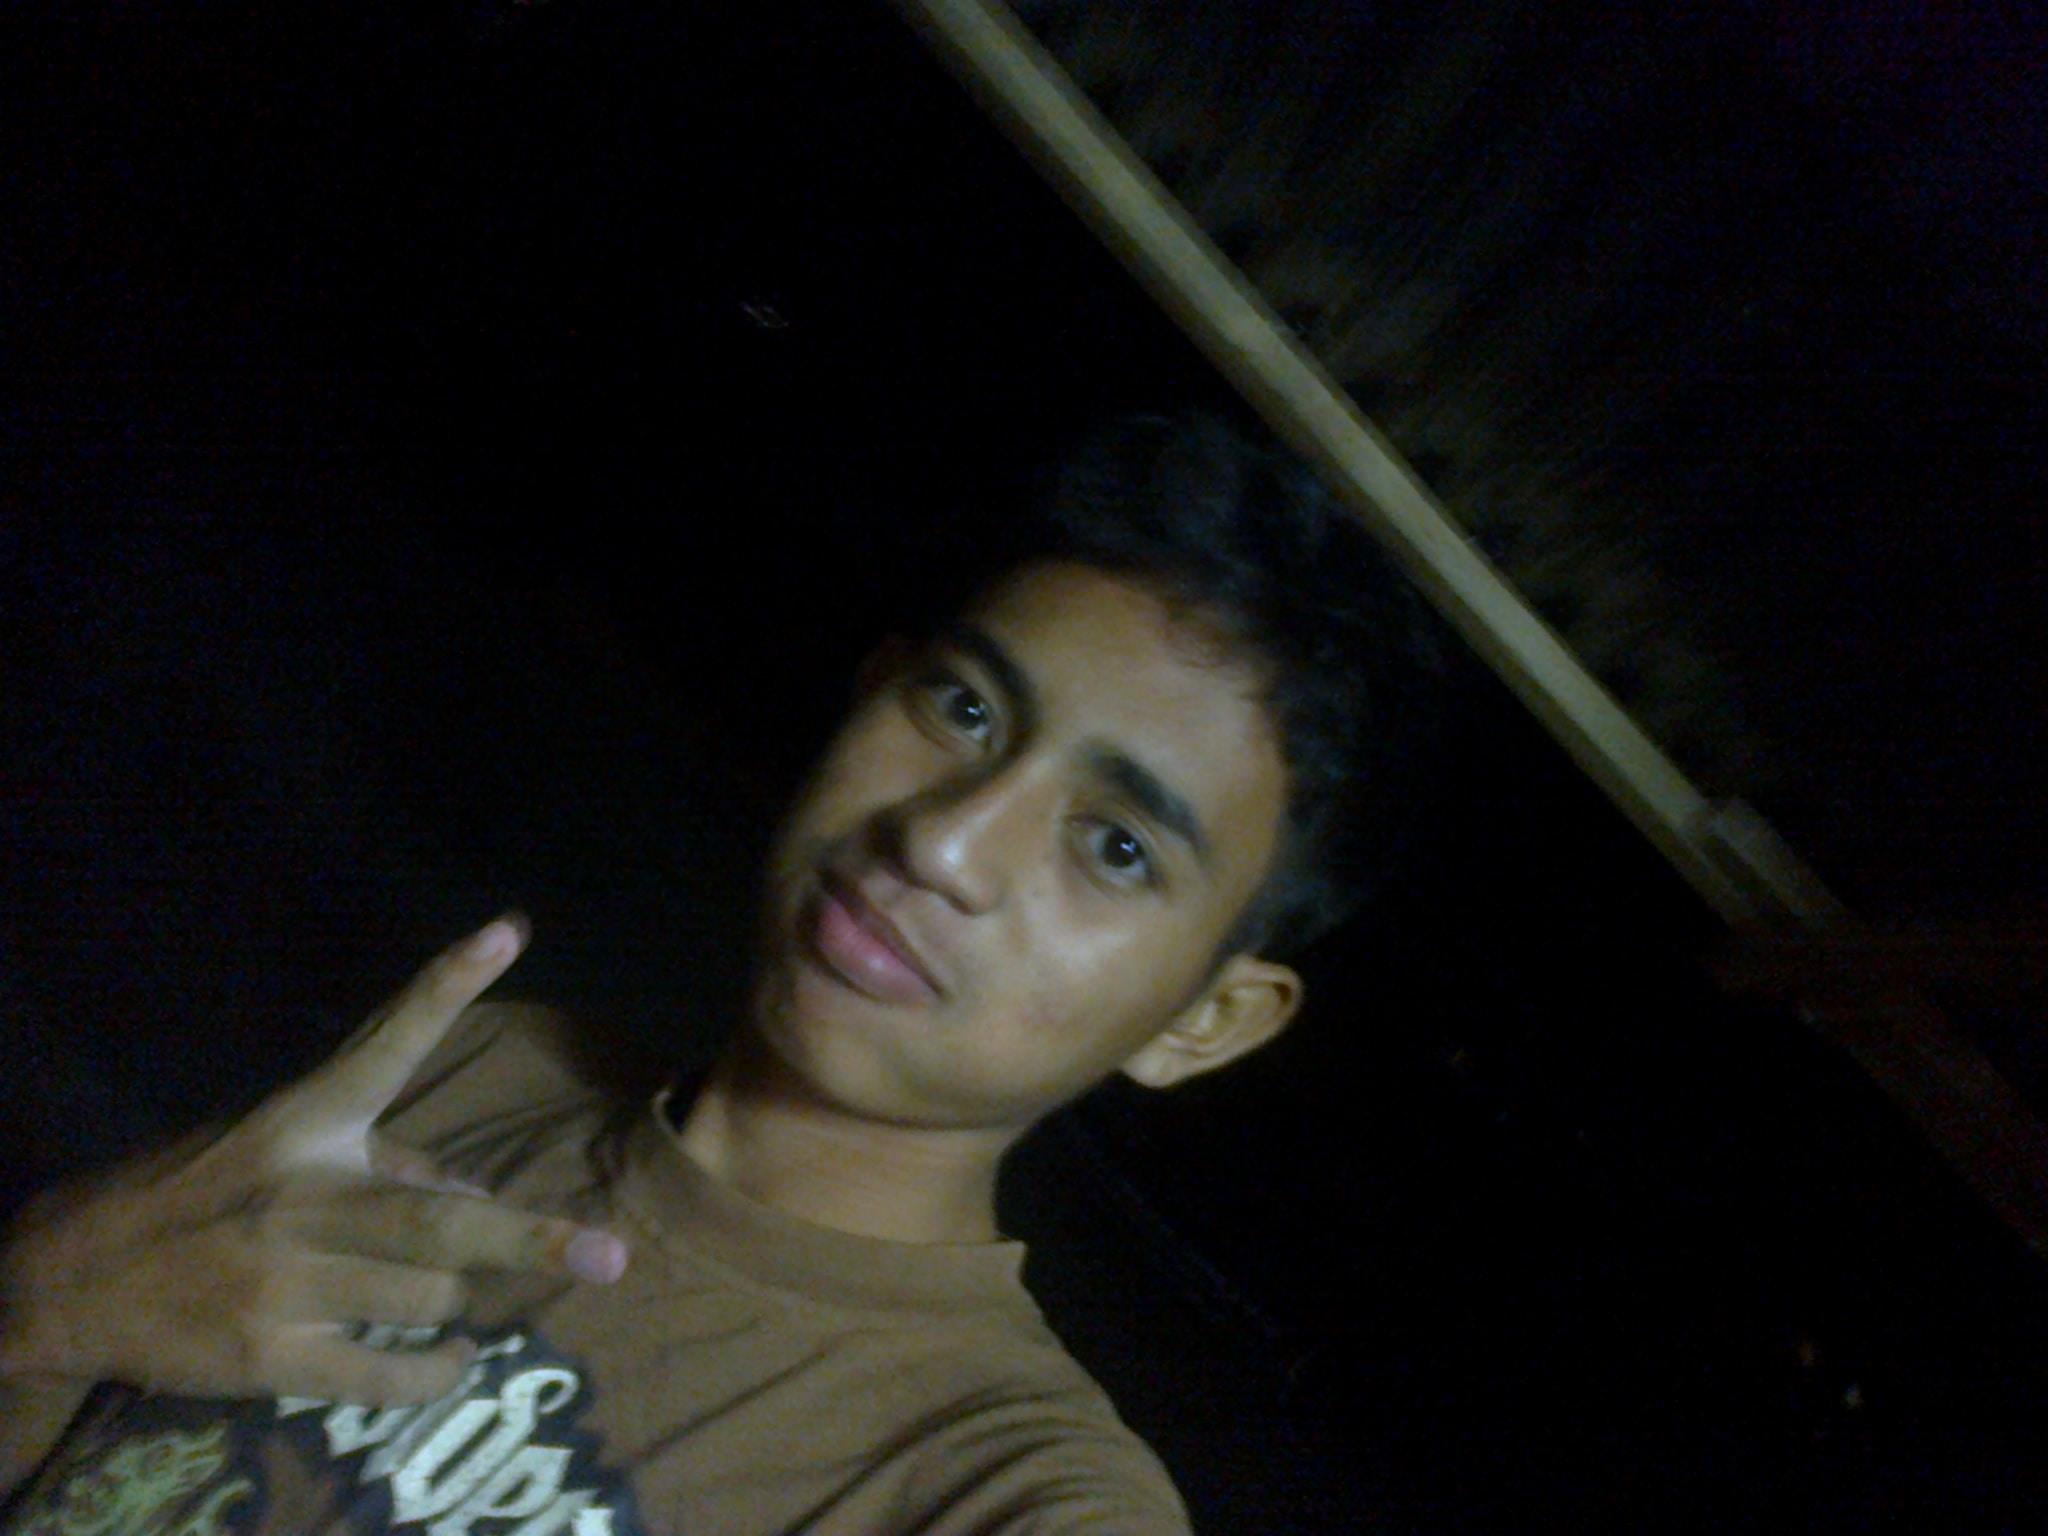 Go to hezron salawane's profile